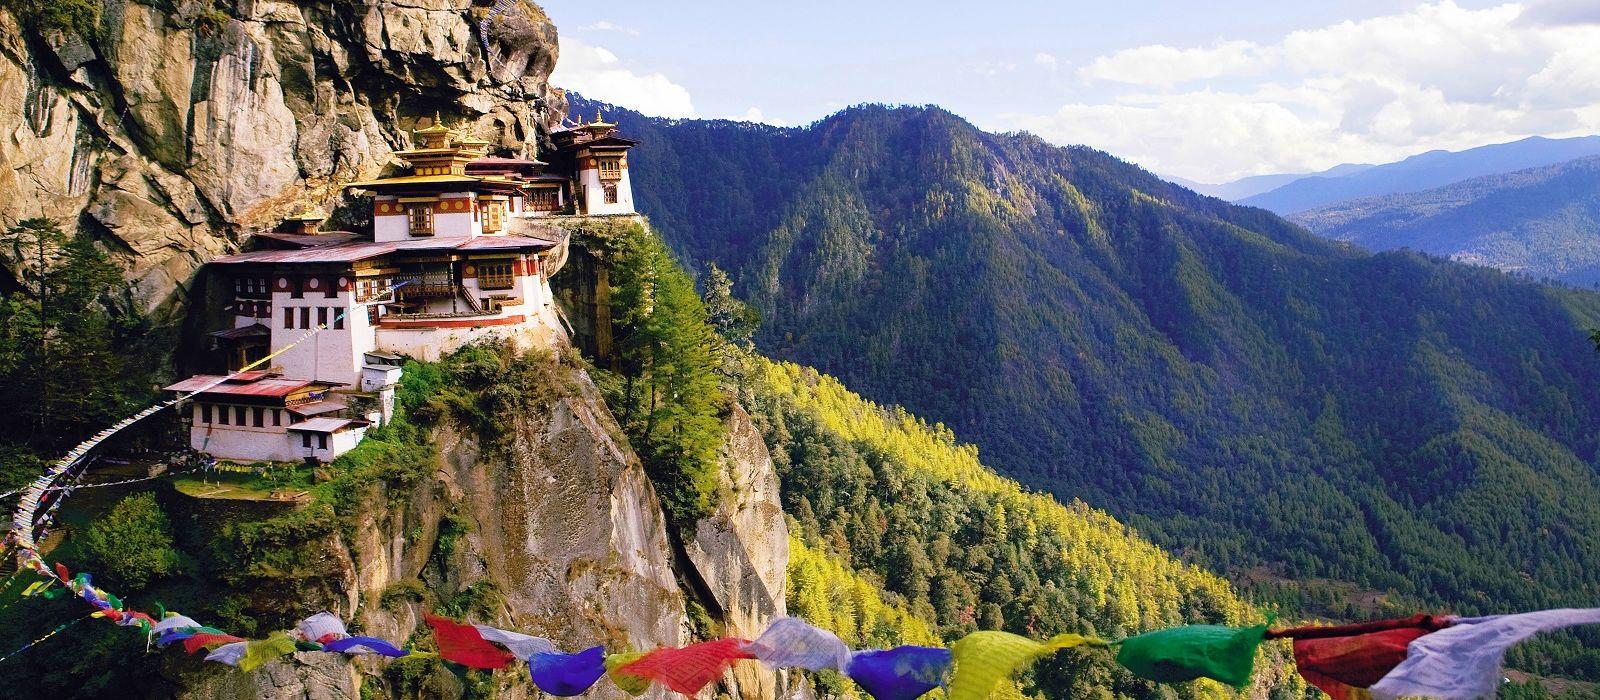 Landschaften, Luxus & Wellness in Asien Urlaub 4